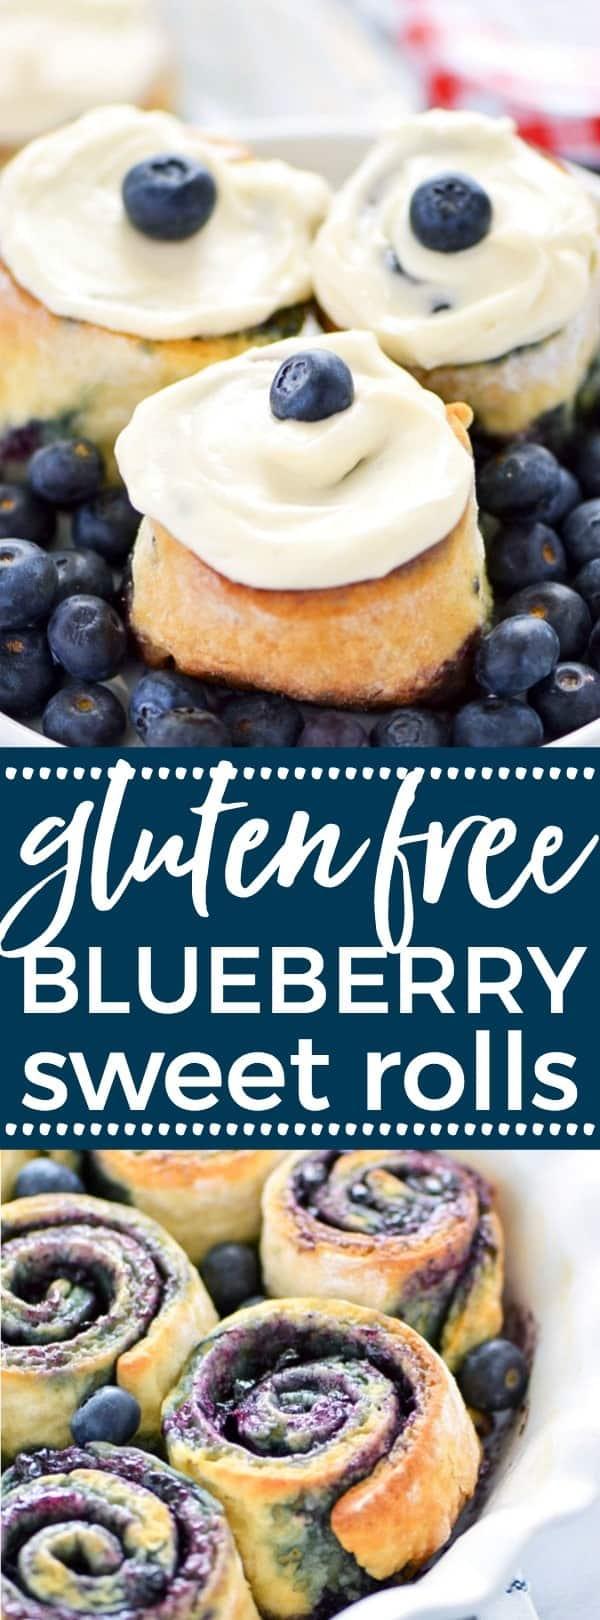 1-Hour Gluten Free Blueberry Sweet Rolls - perfect for brunch! Recipe from @whattheforkblog   whattheforkfoodblog.com   gluten free baking   easy gluten free recipes   gluten free bread recipes   yeast rolls   brunch recipes